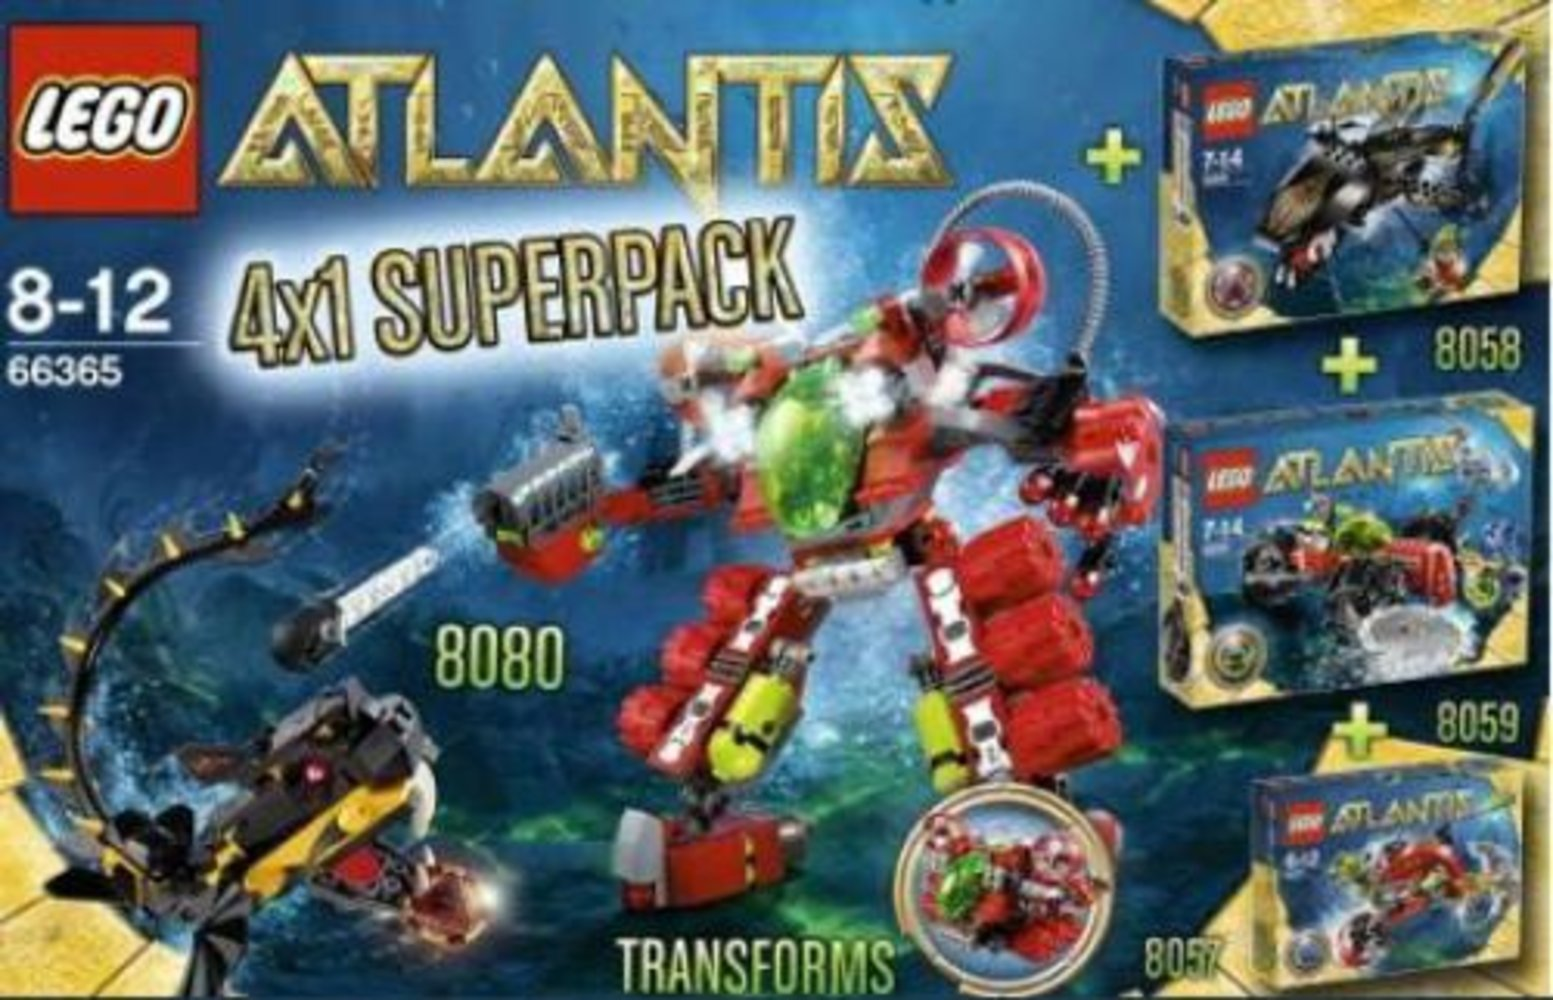 Atlantis Super Pack 4 in 1 (8057 8058 8059 8080)